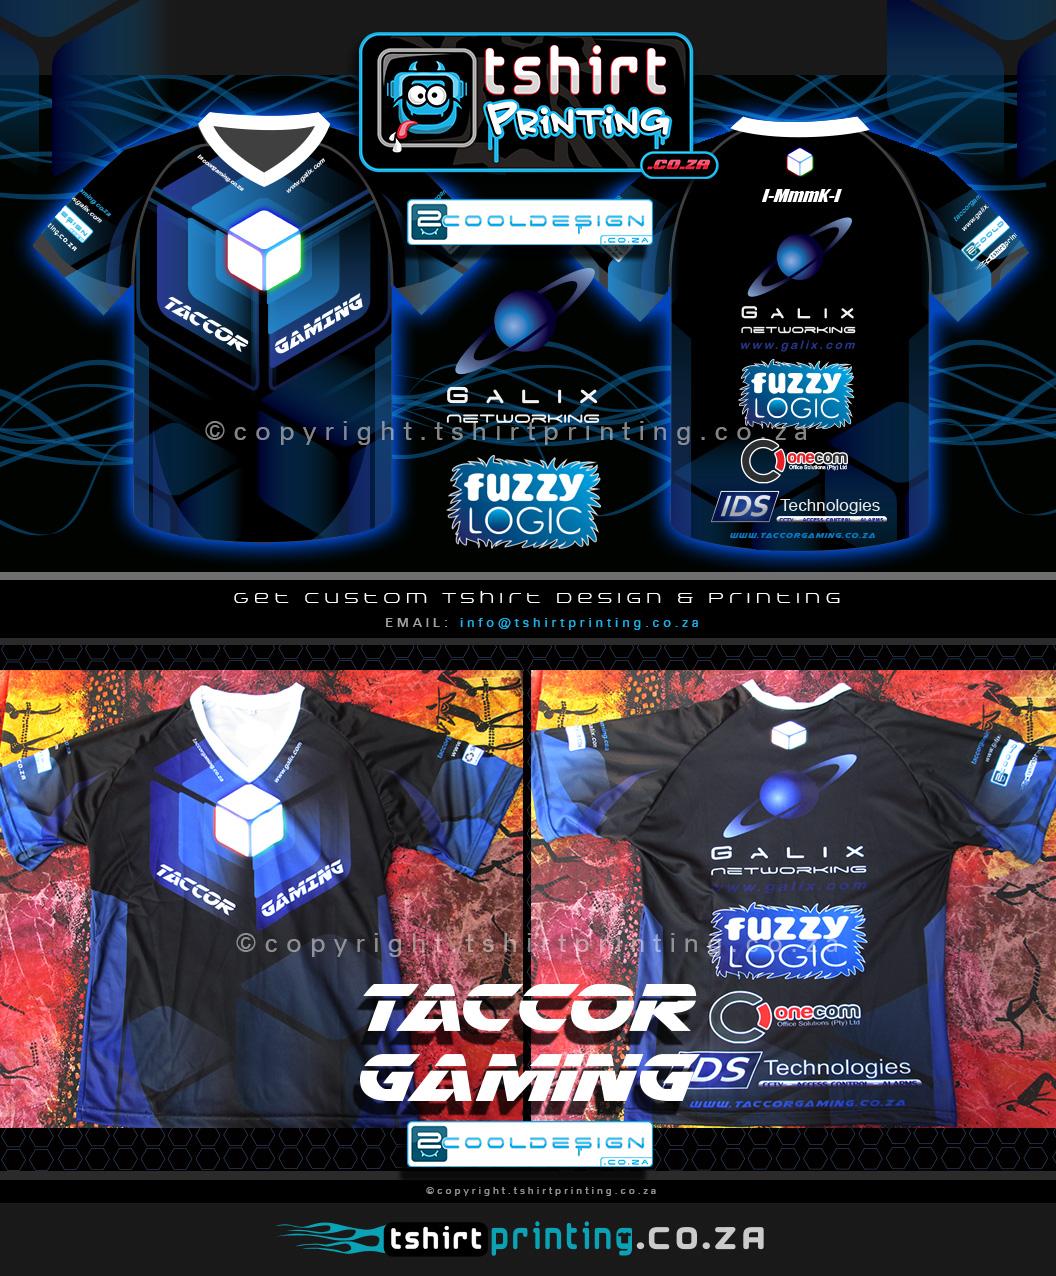 T shirt design za - V Neck Gamer Shirt Printing